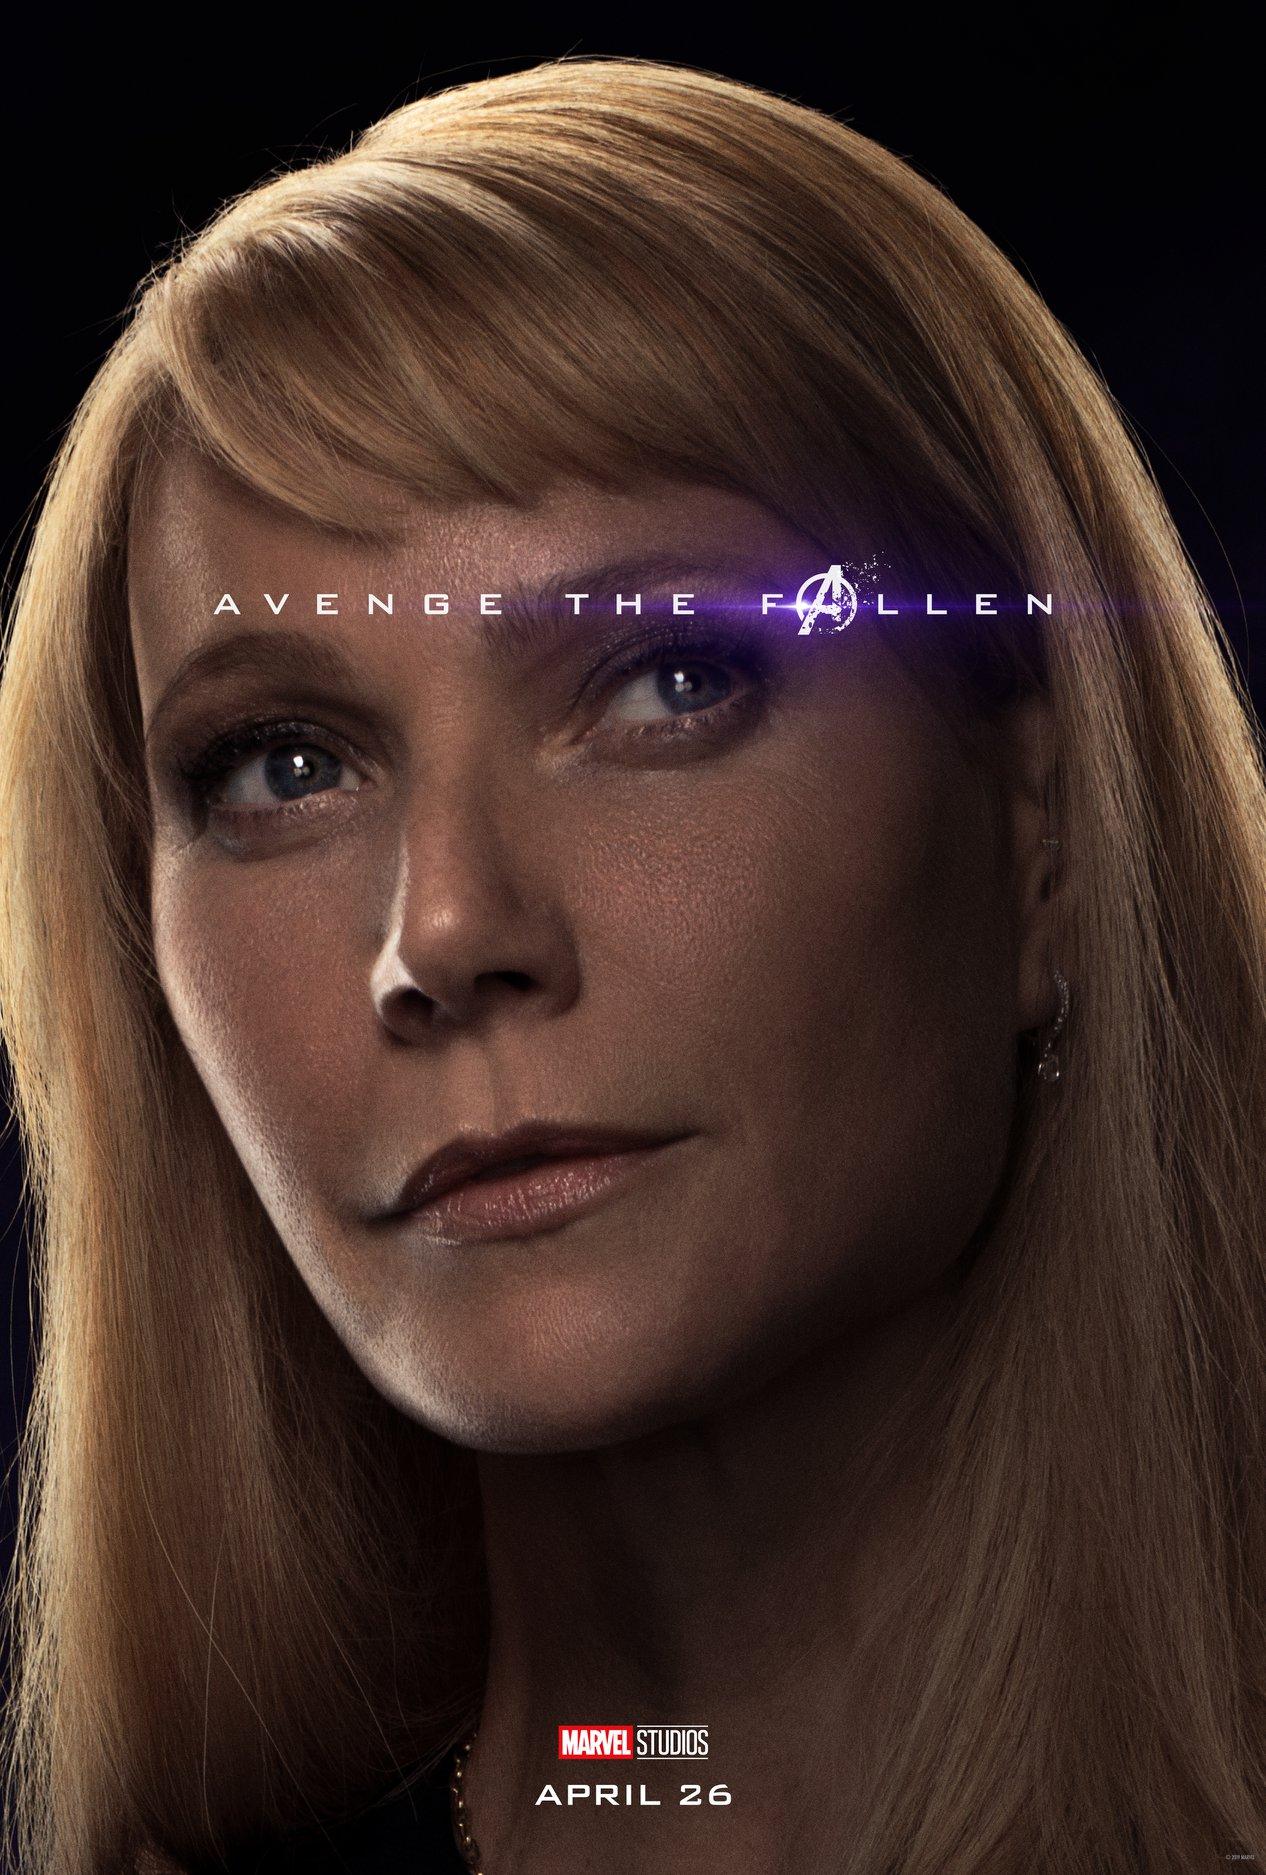 avengers_endgame_p16.png